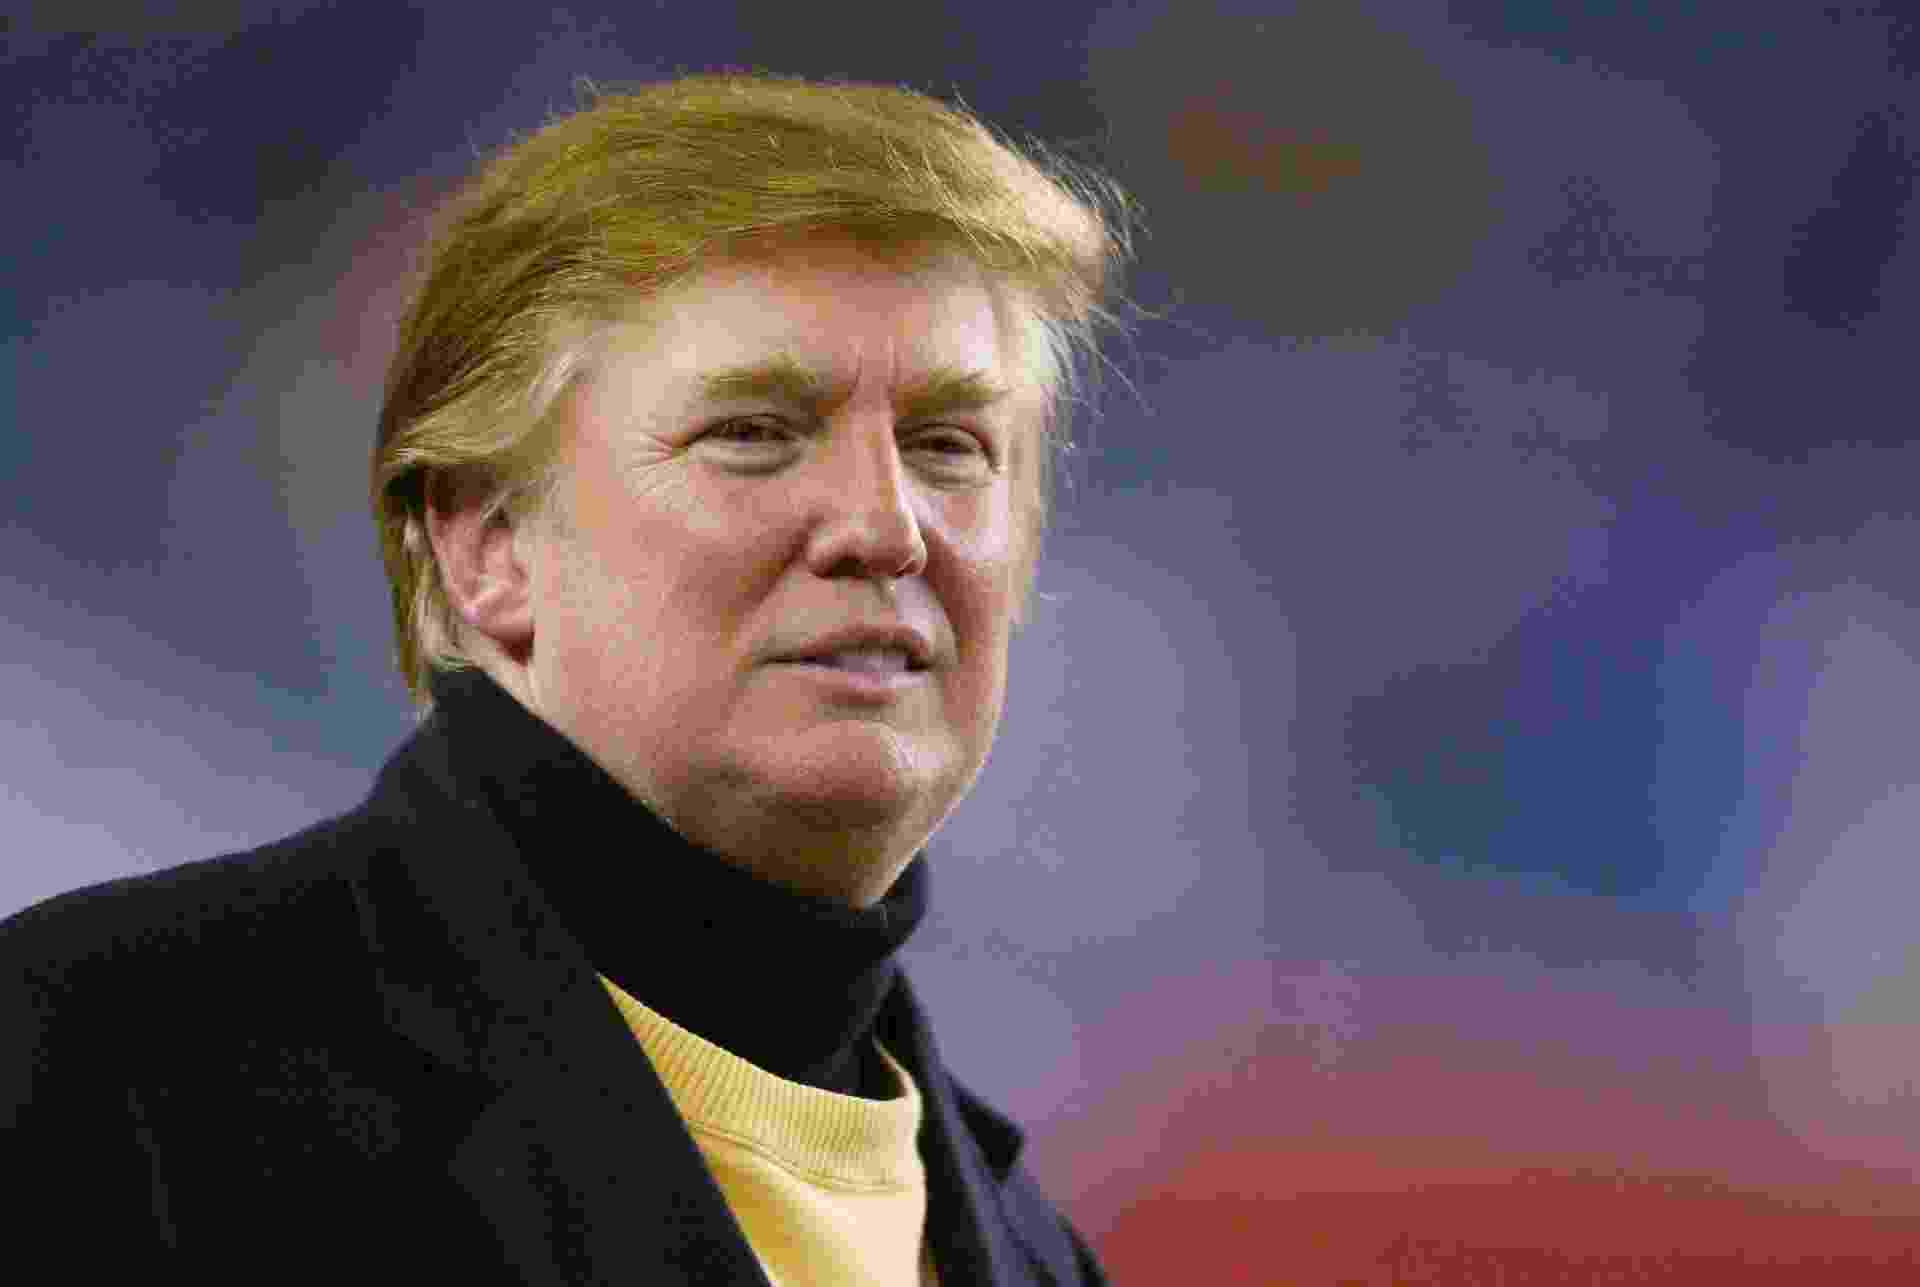 Cabelo Donald Trump - Beleza - Getty Images